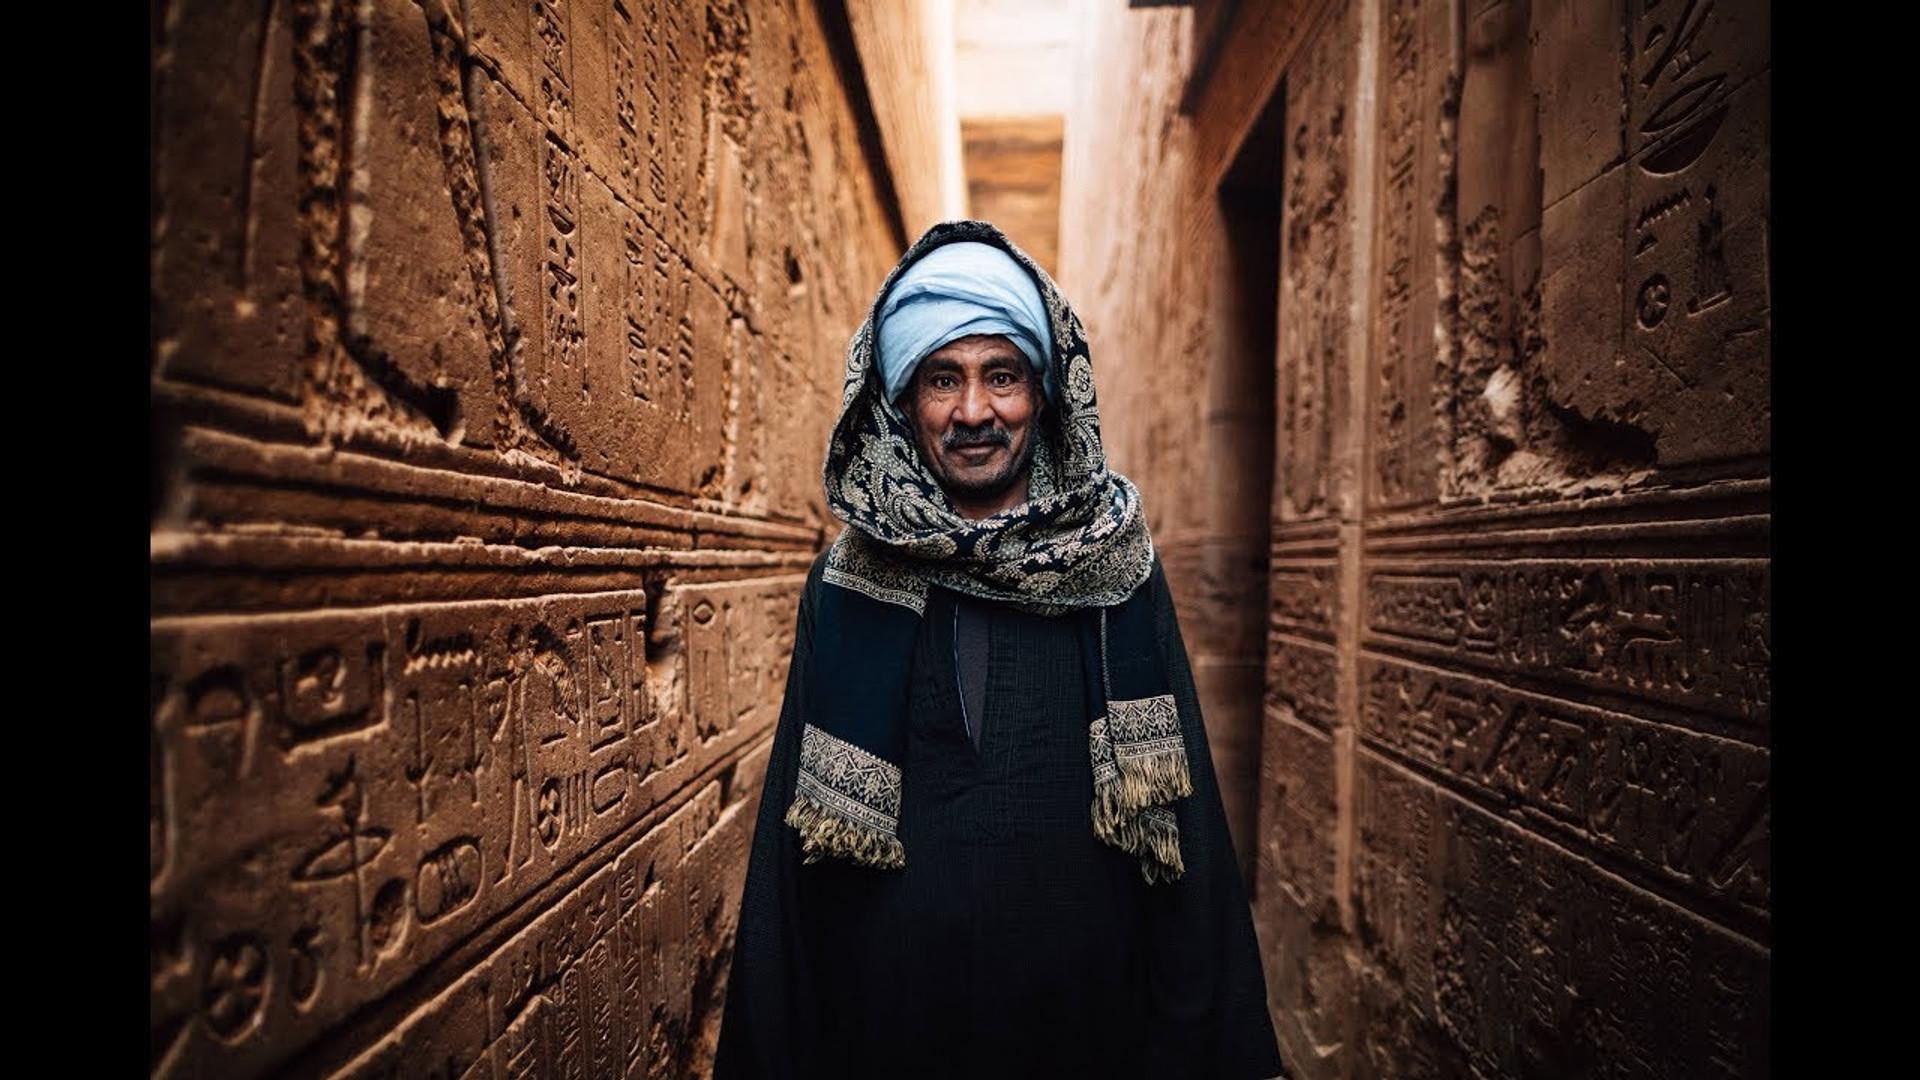 Egito - Apaixone-se!